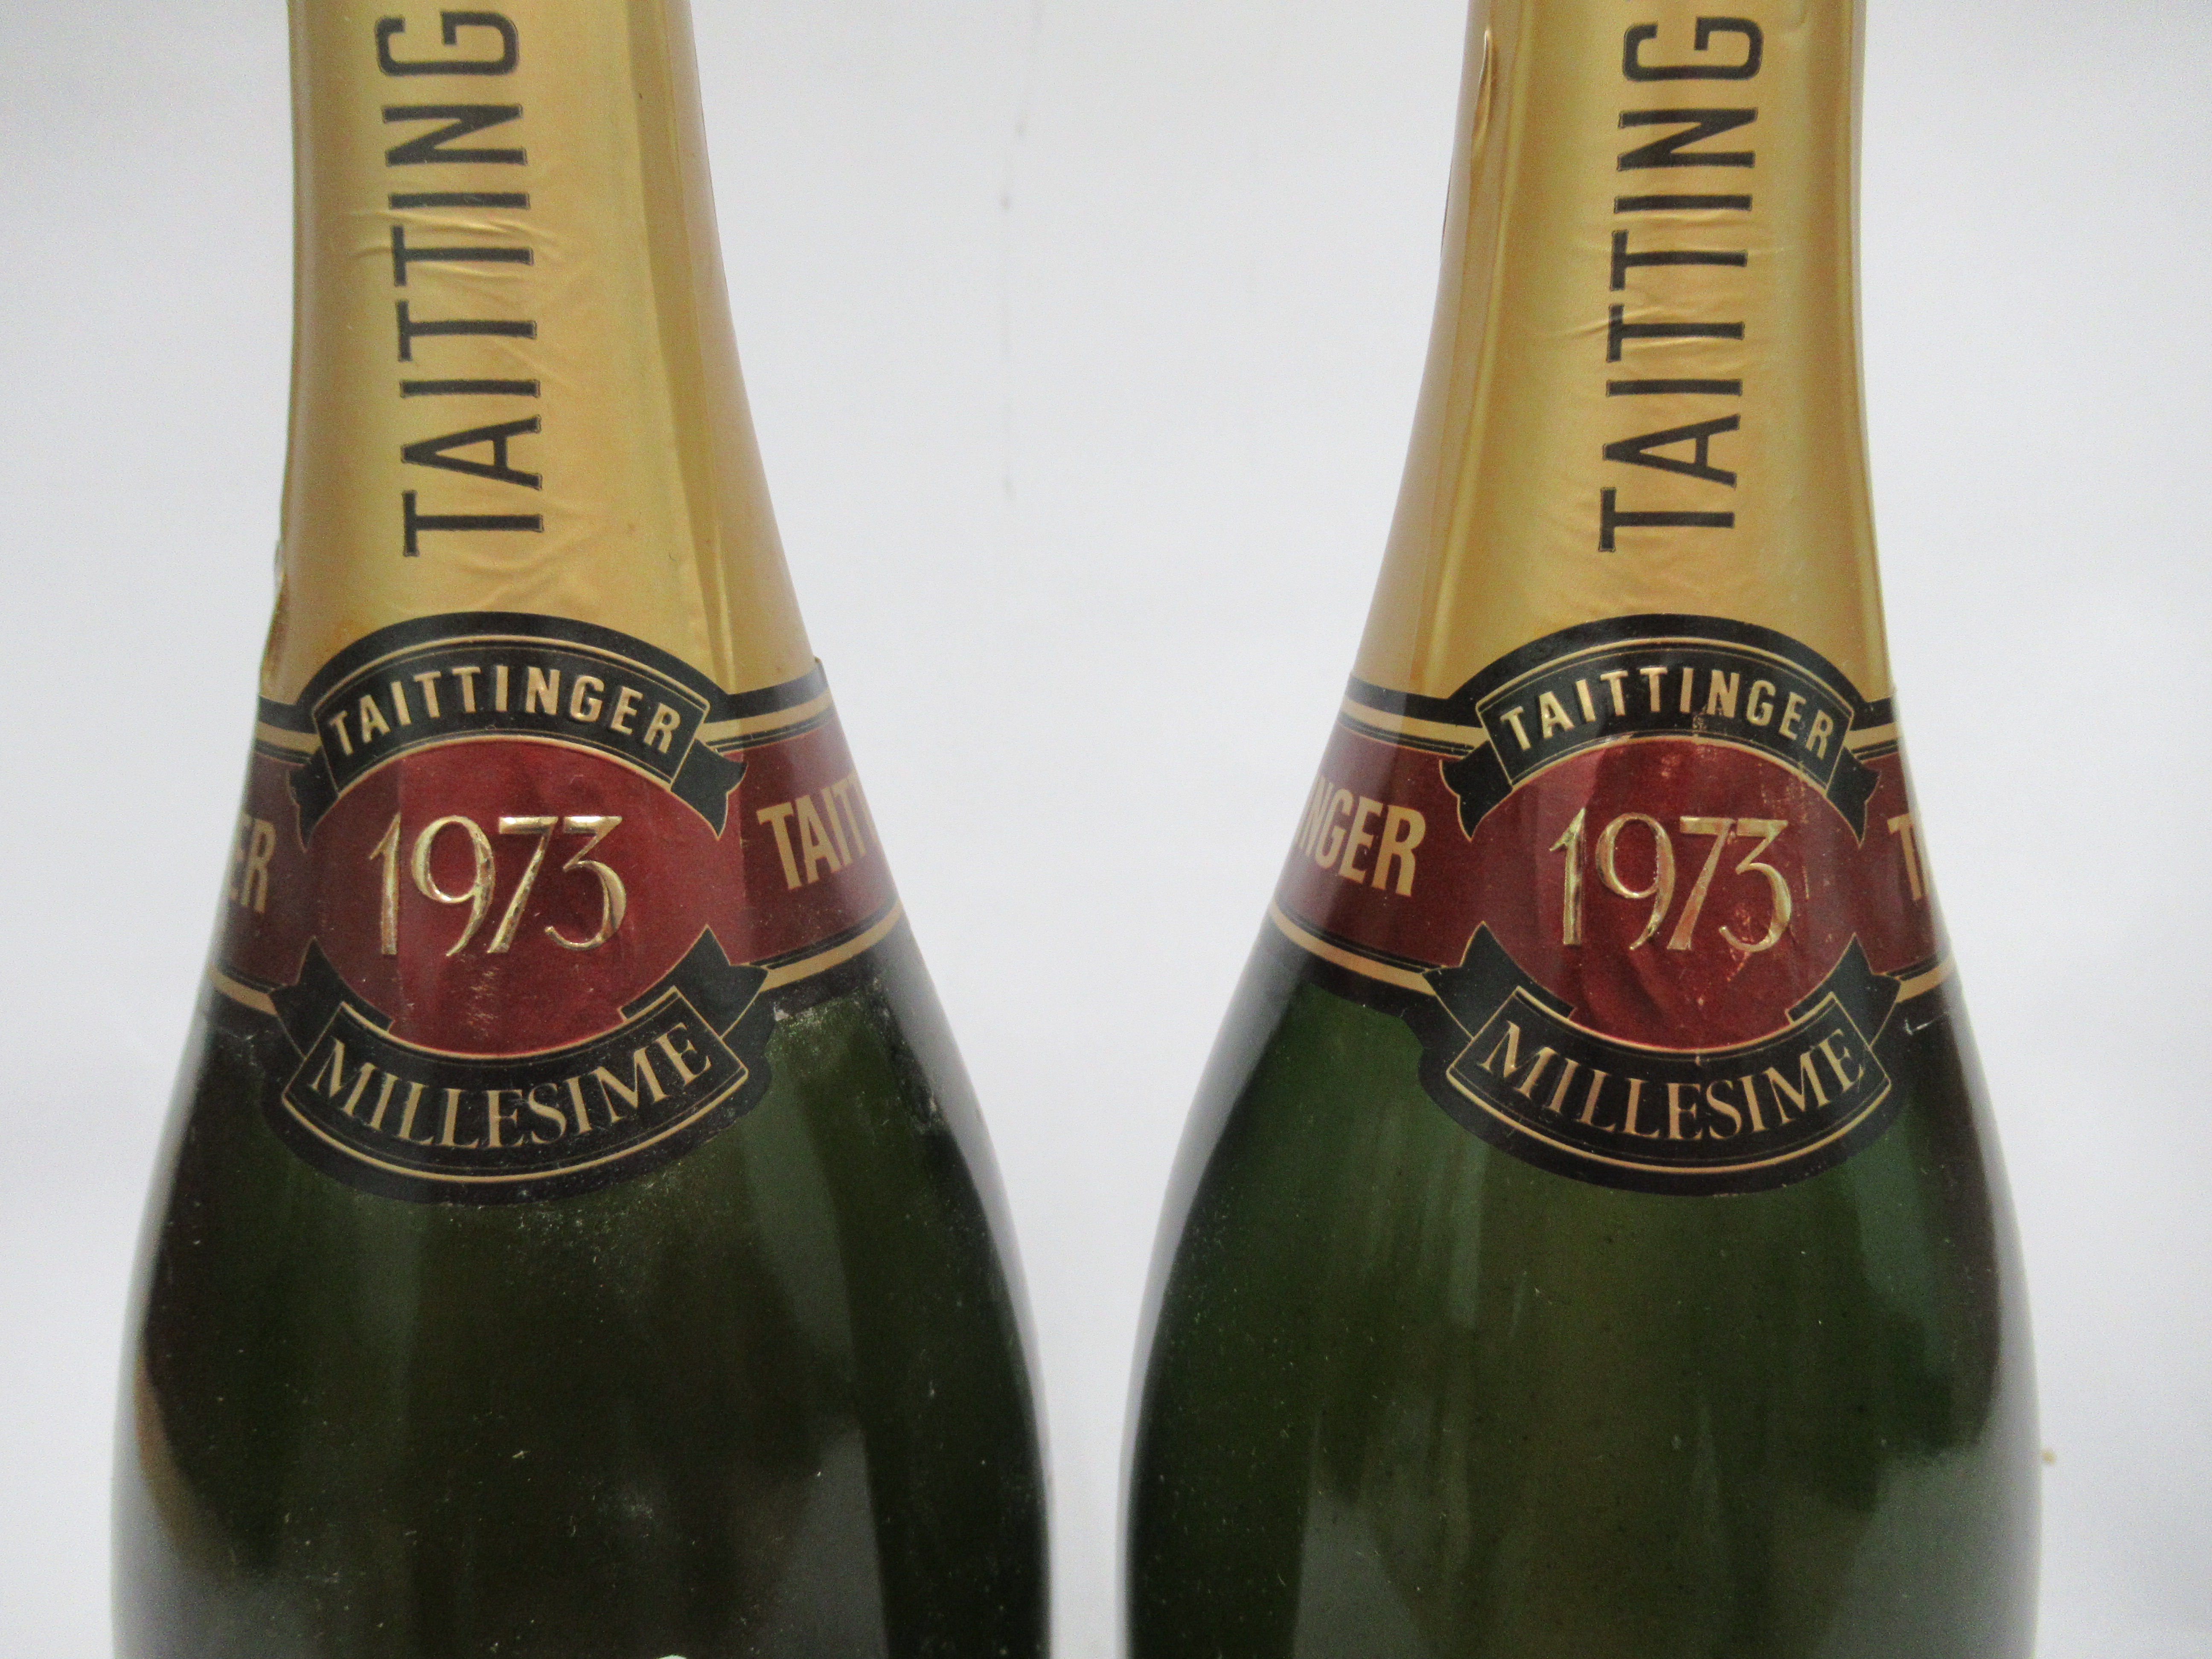 Wine, two bottles of 1973 Taittinger Millesime Champagne - Image 2 of 3